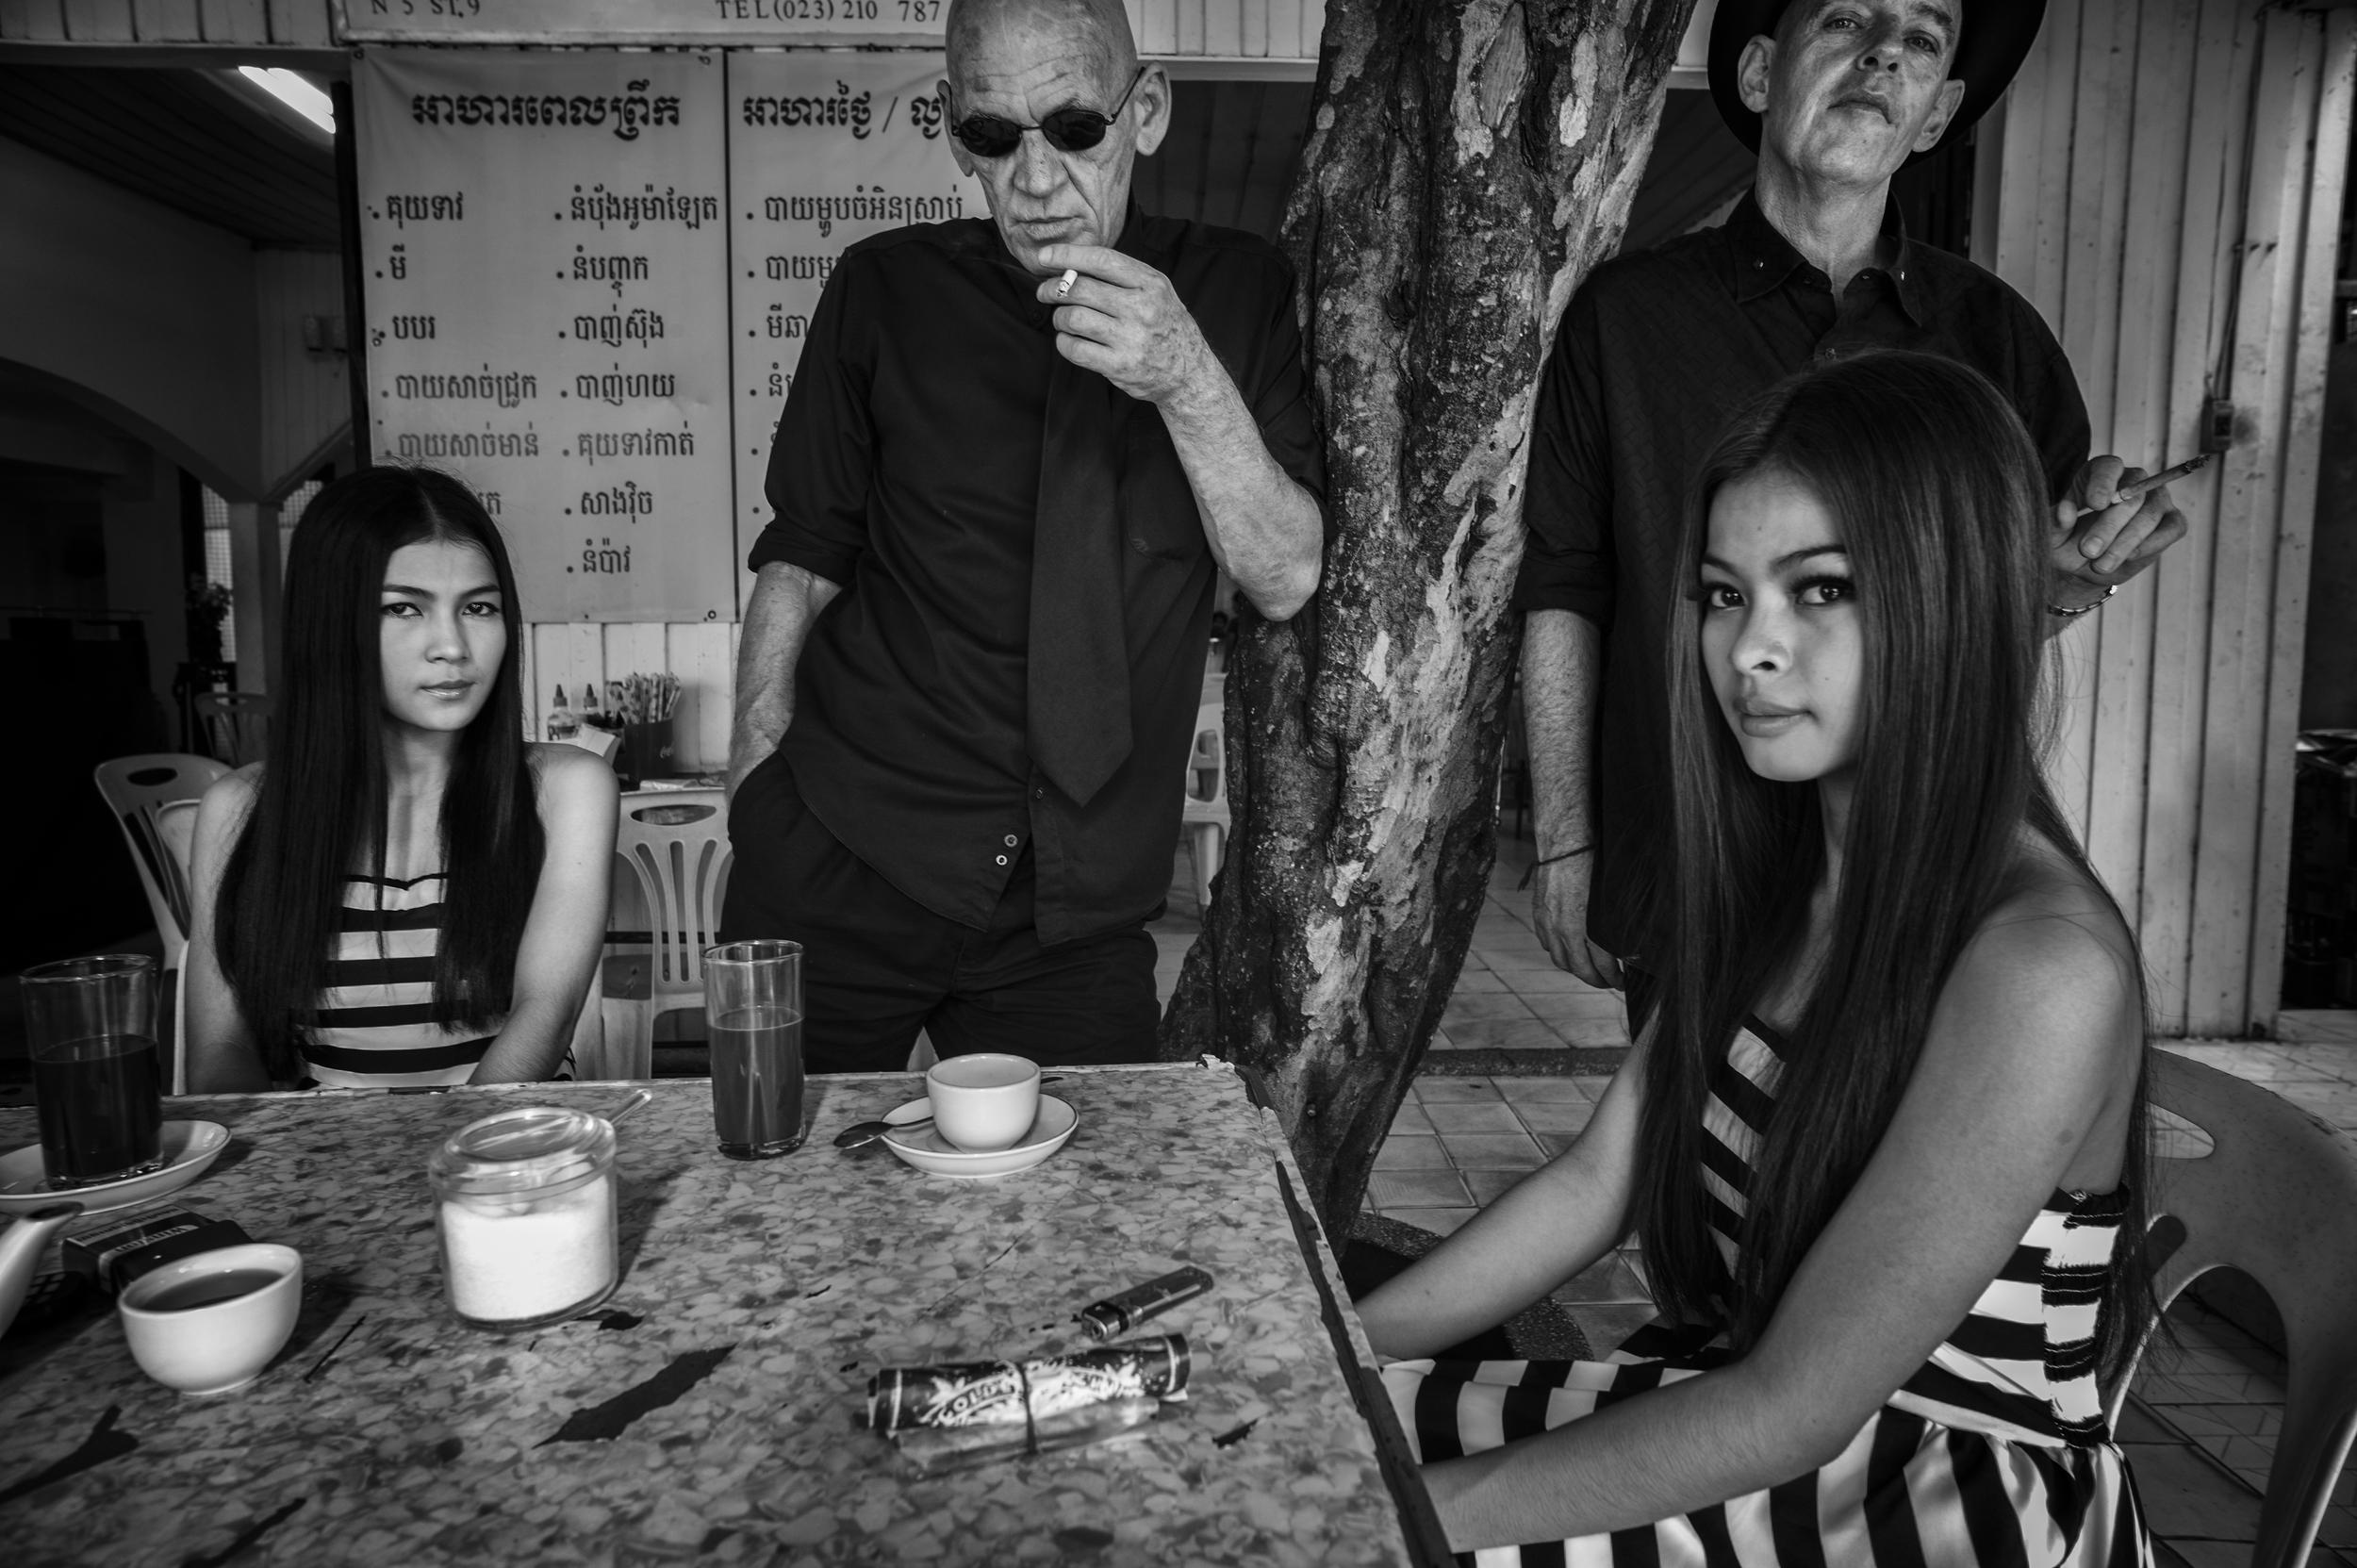 KROM: Songs from the Noir & The Mekong Heart